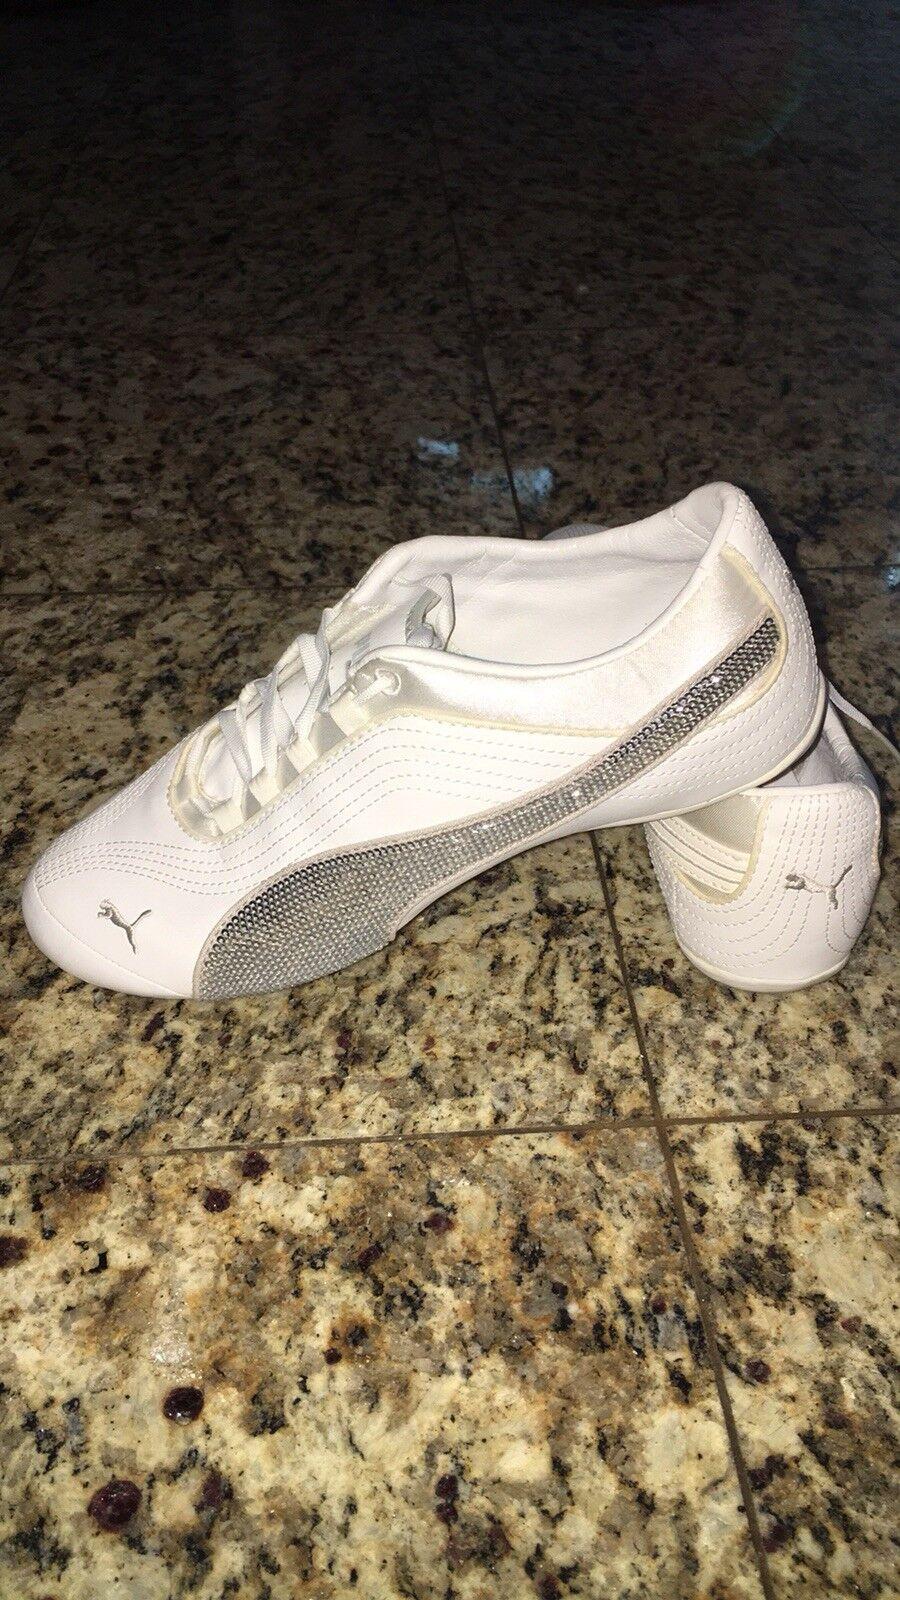 Puma eco ortholite sequins sneakers